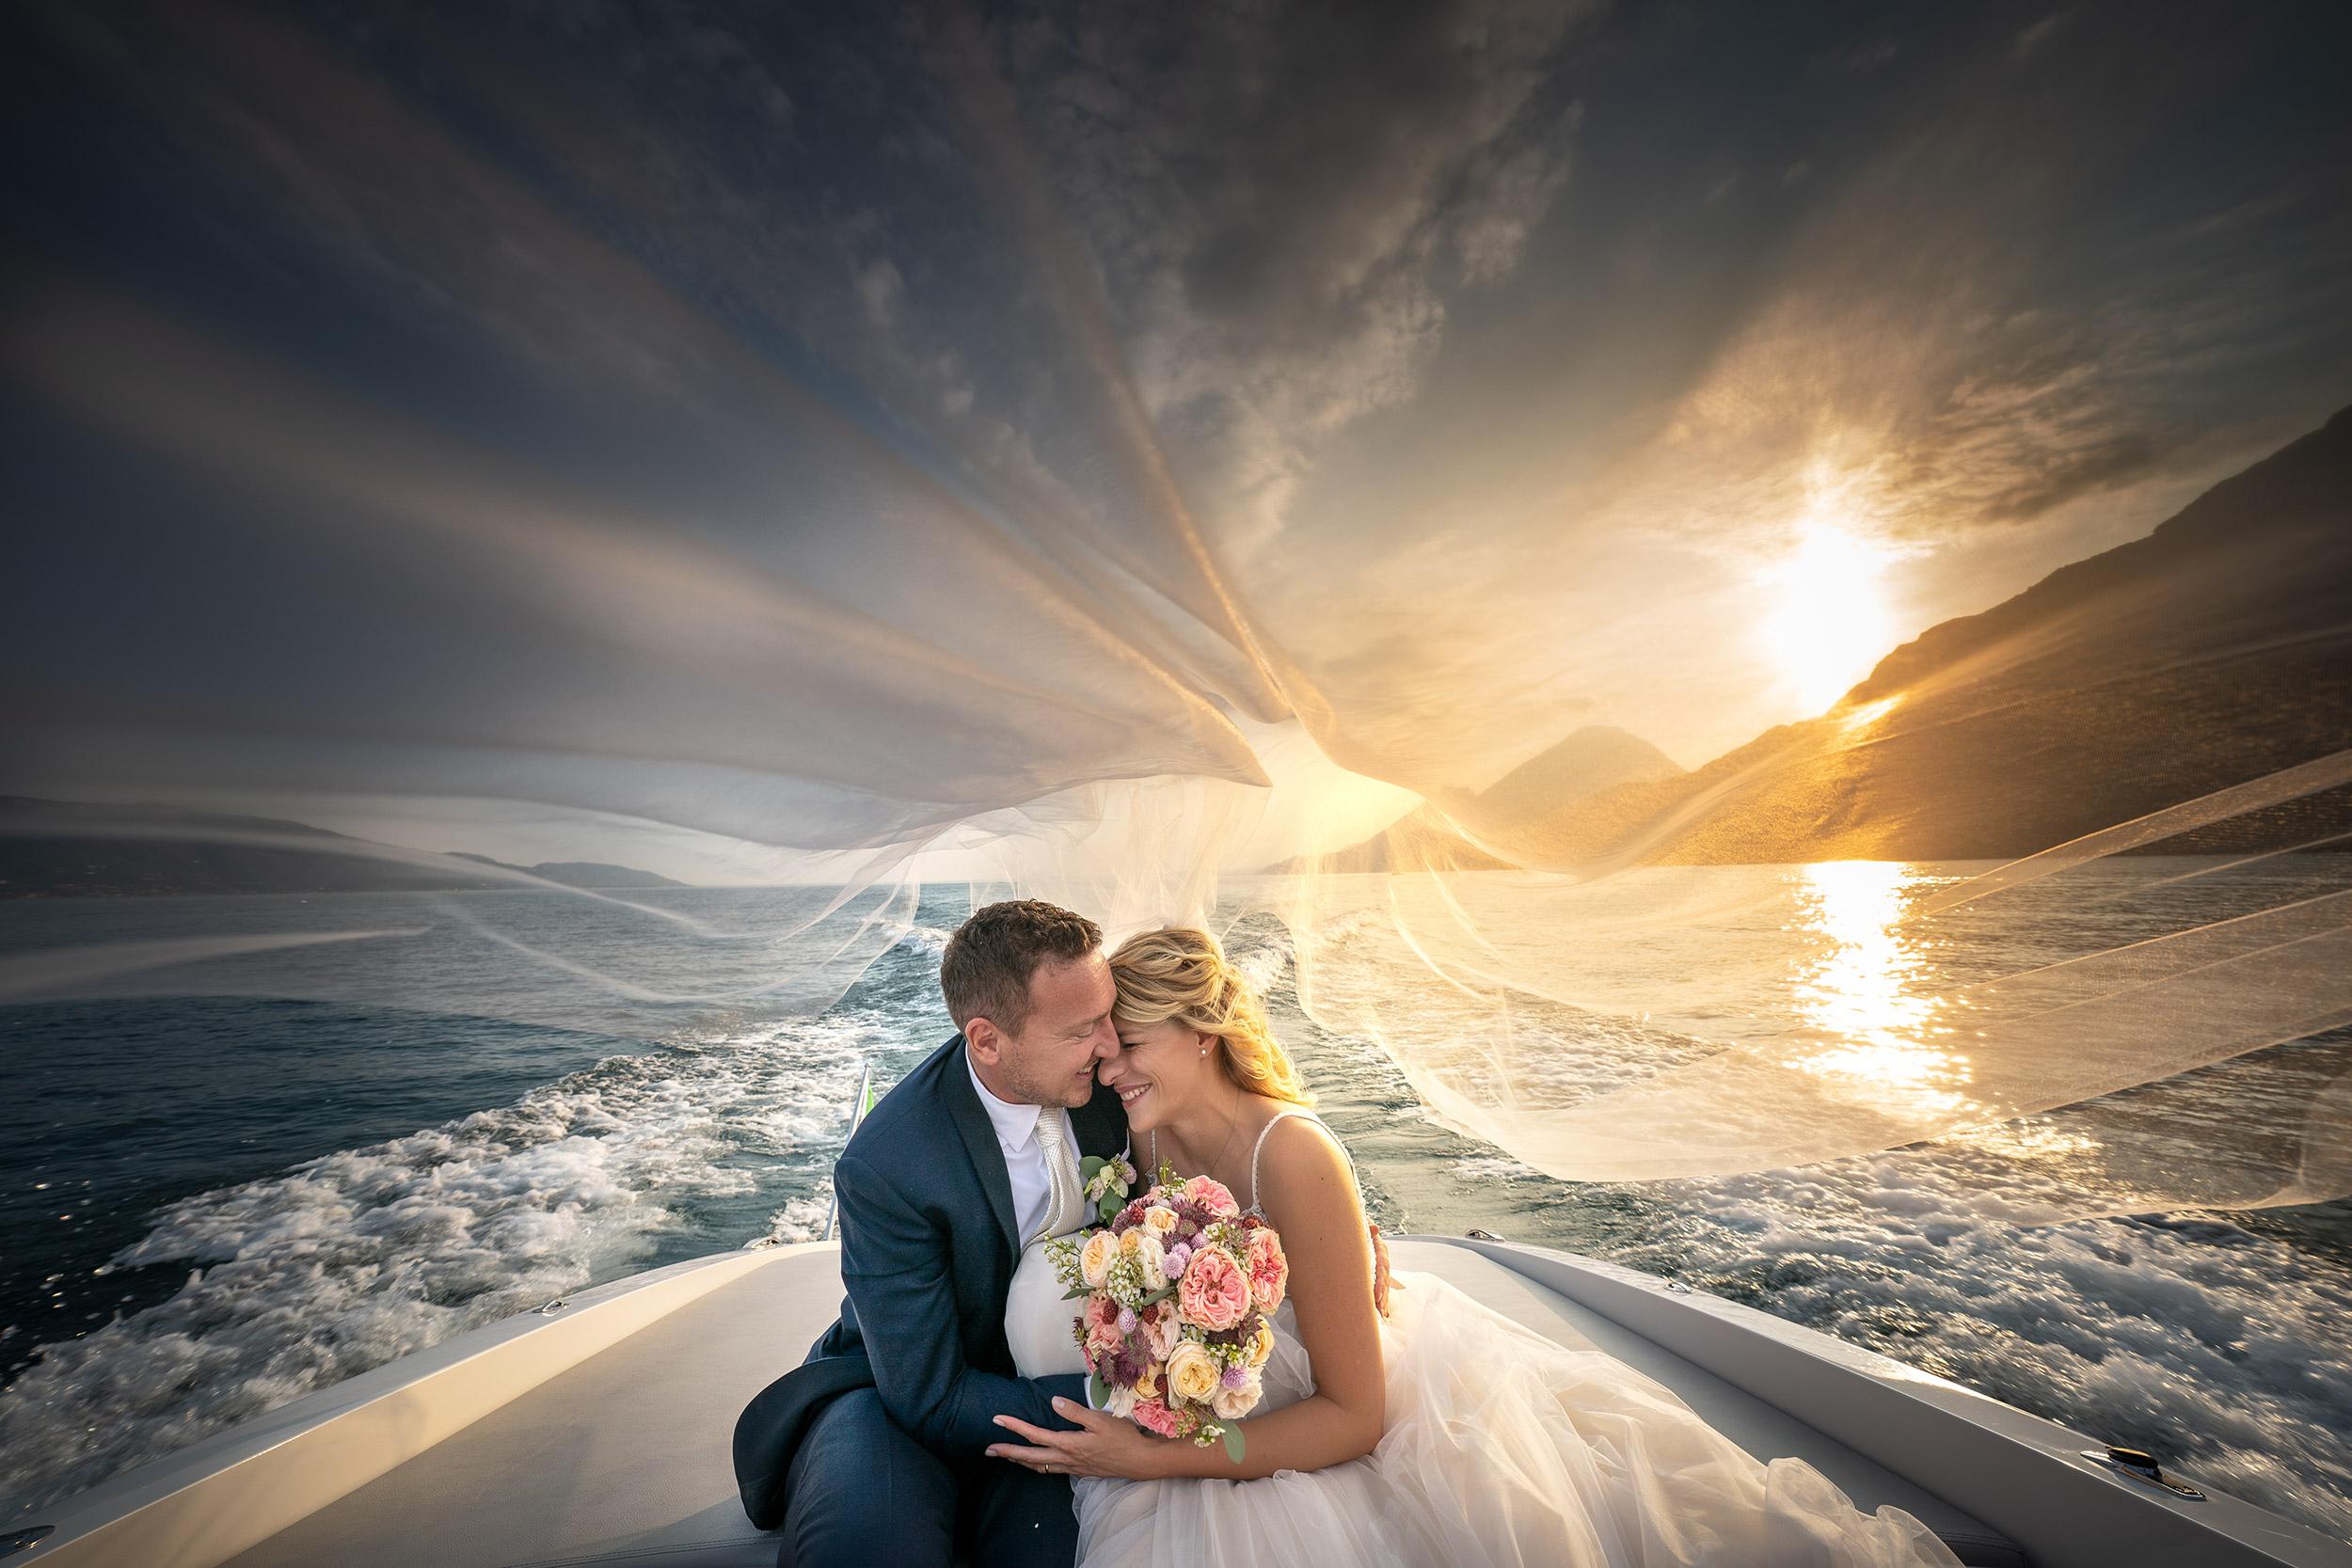 038 fotografo matrimonio wedding sposi motoscafo barca lago di garda 2